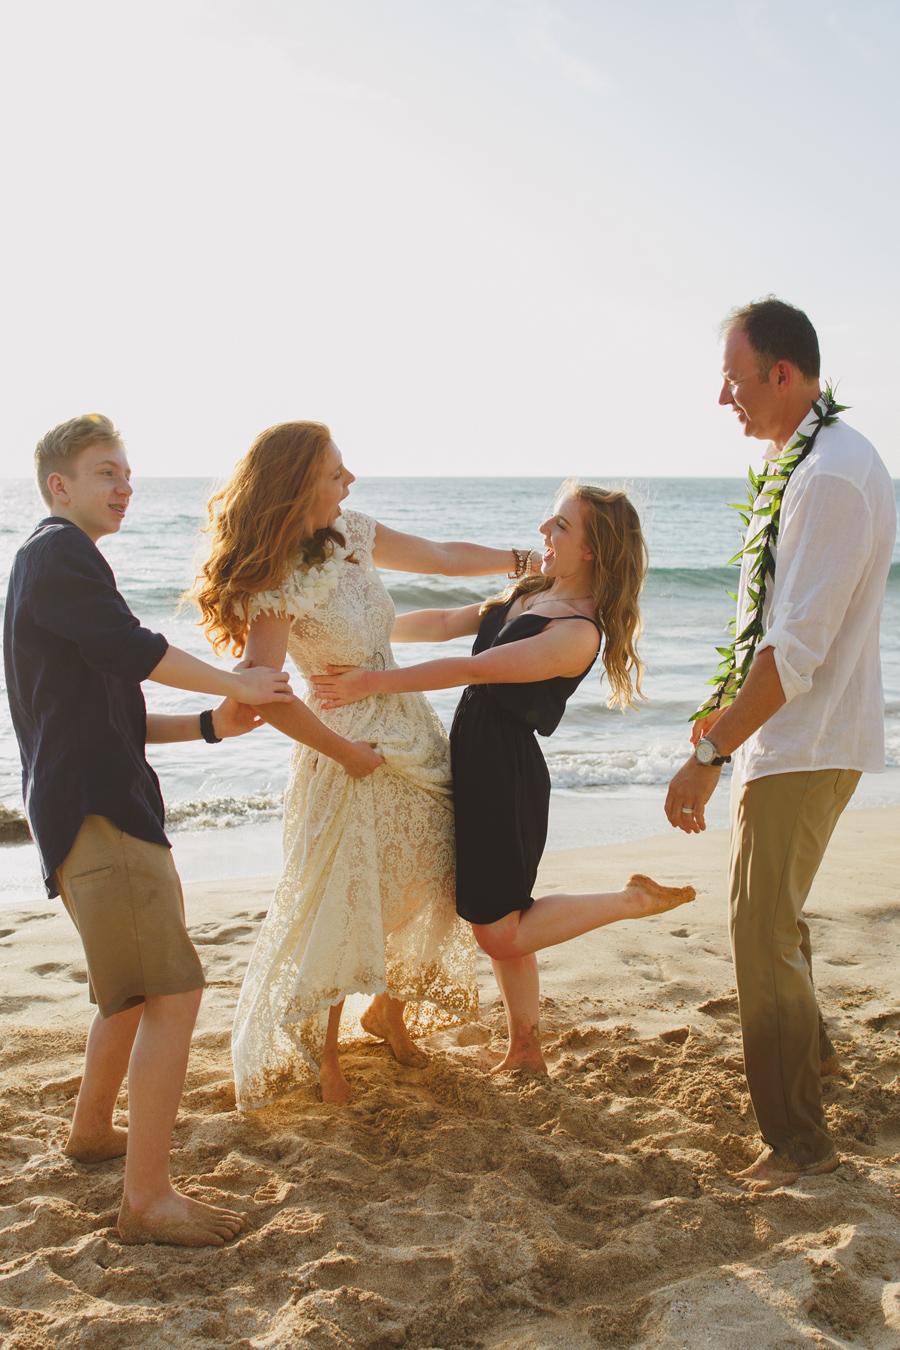 Family Fun Wedding Photography Maui